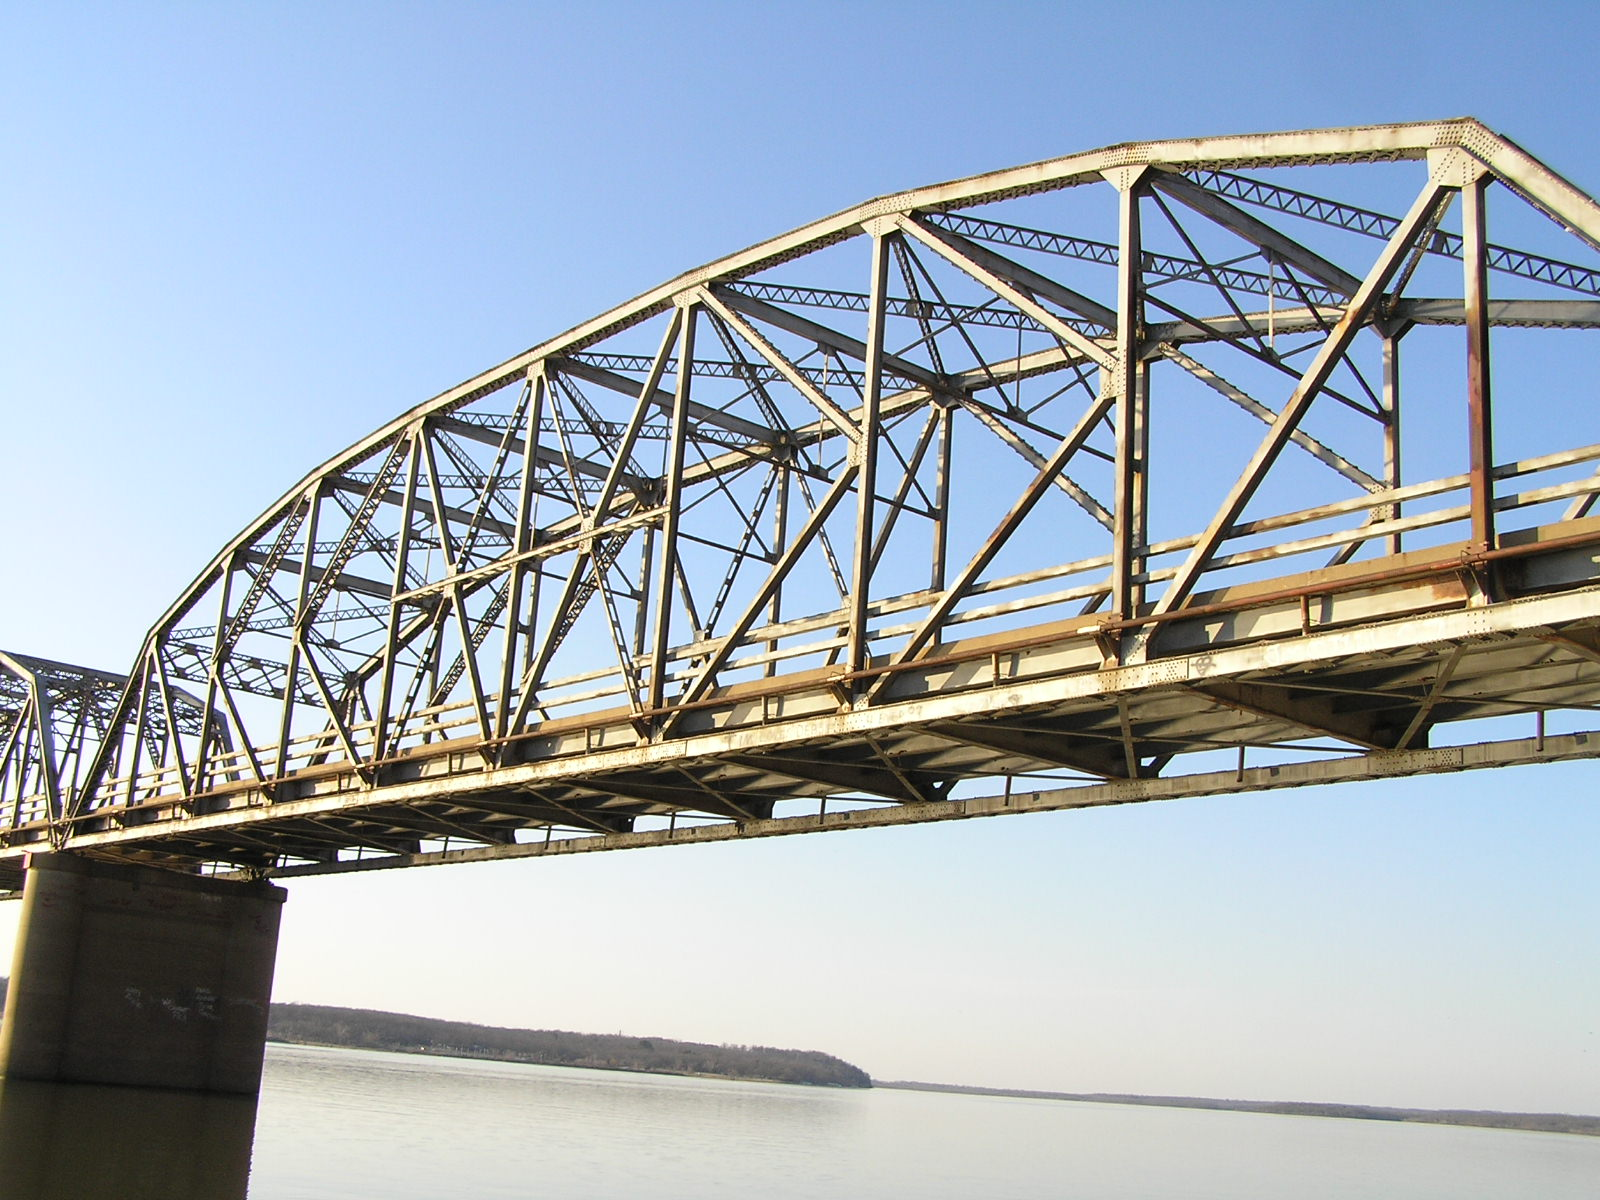 Famous truss bridge designs images for Bridge design